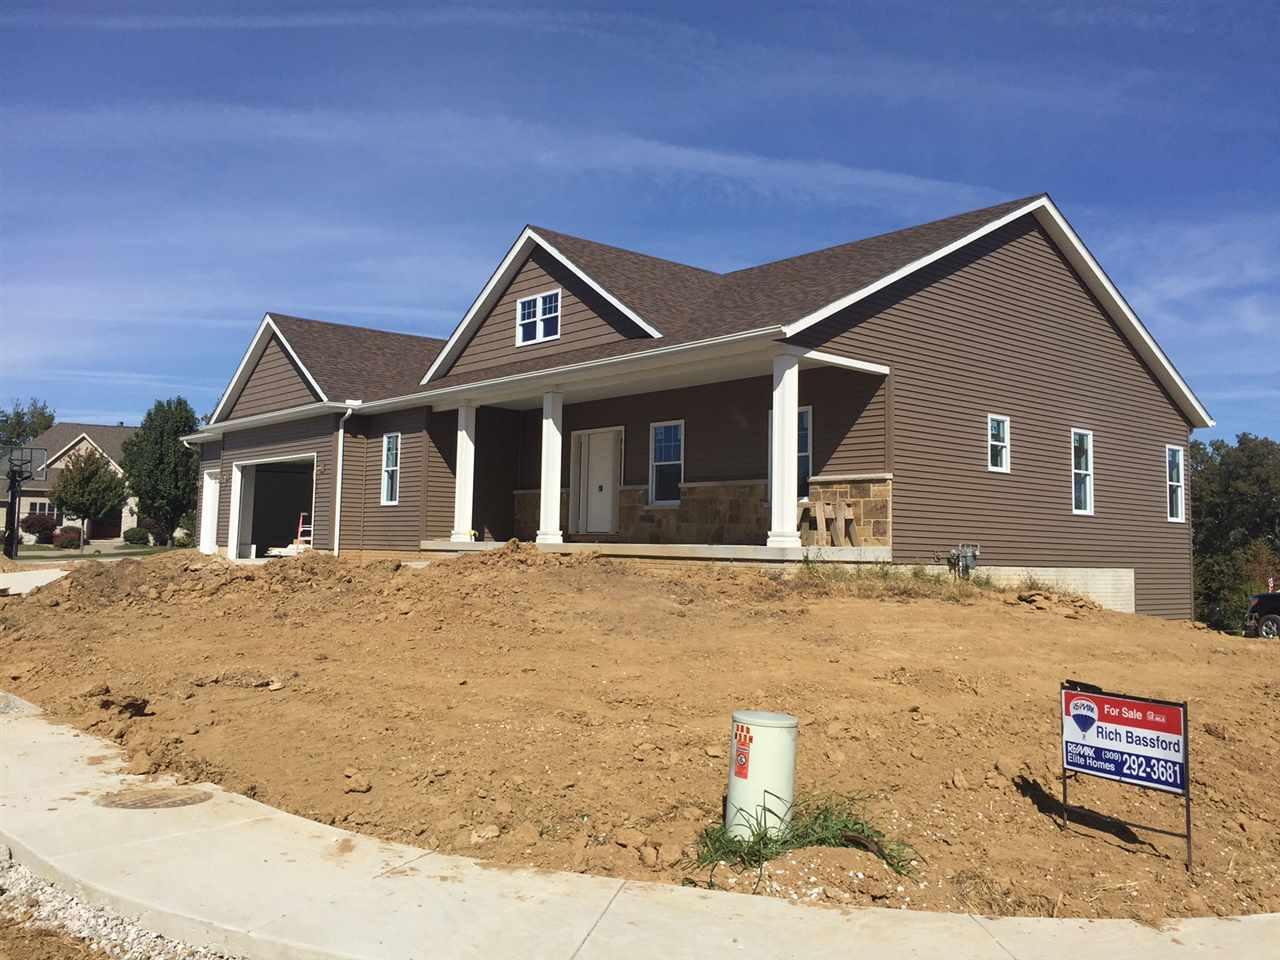 Real Estate for Sale, ListingId: 35503112, Coal Valley,IL61240